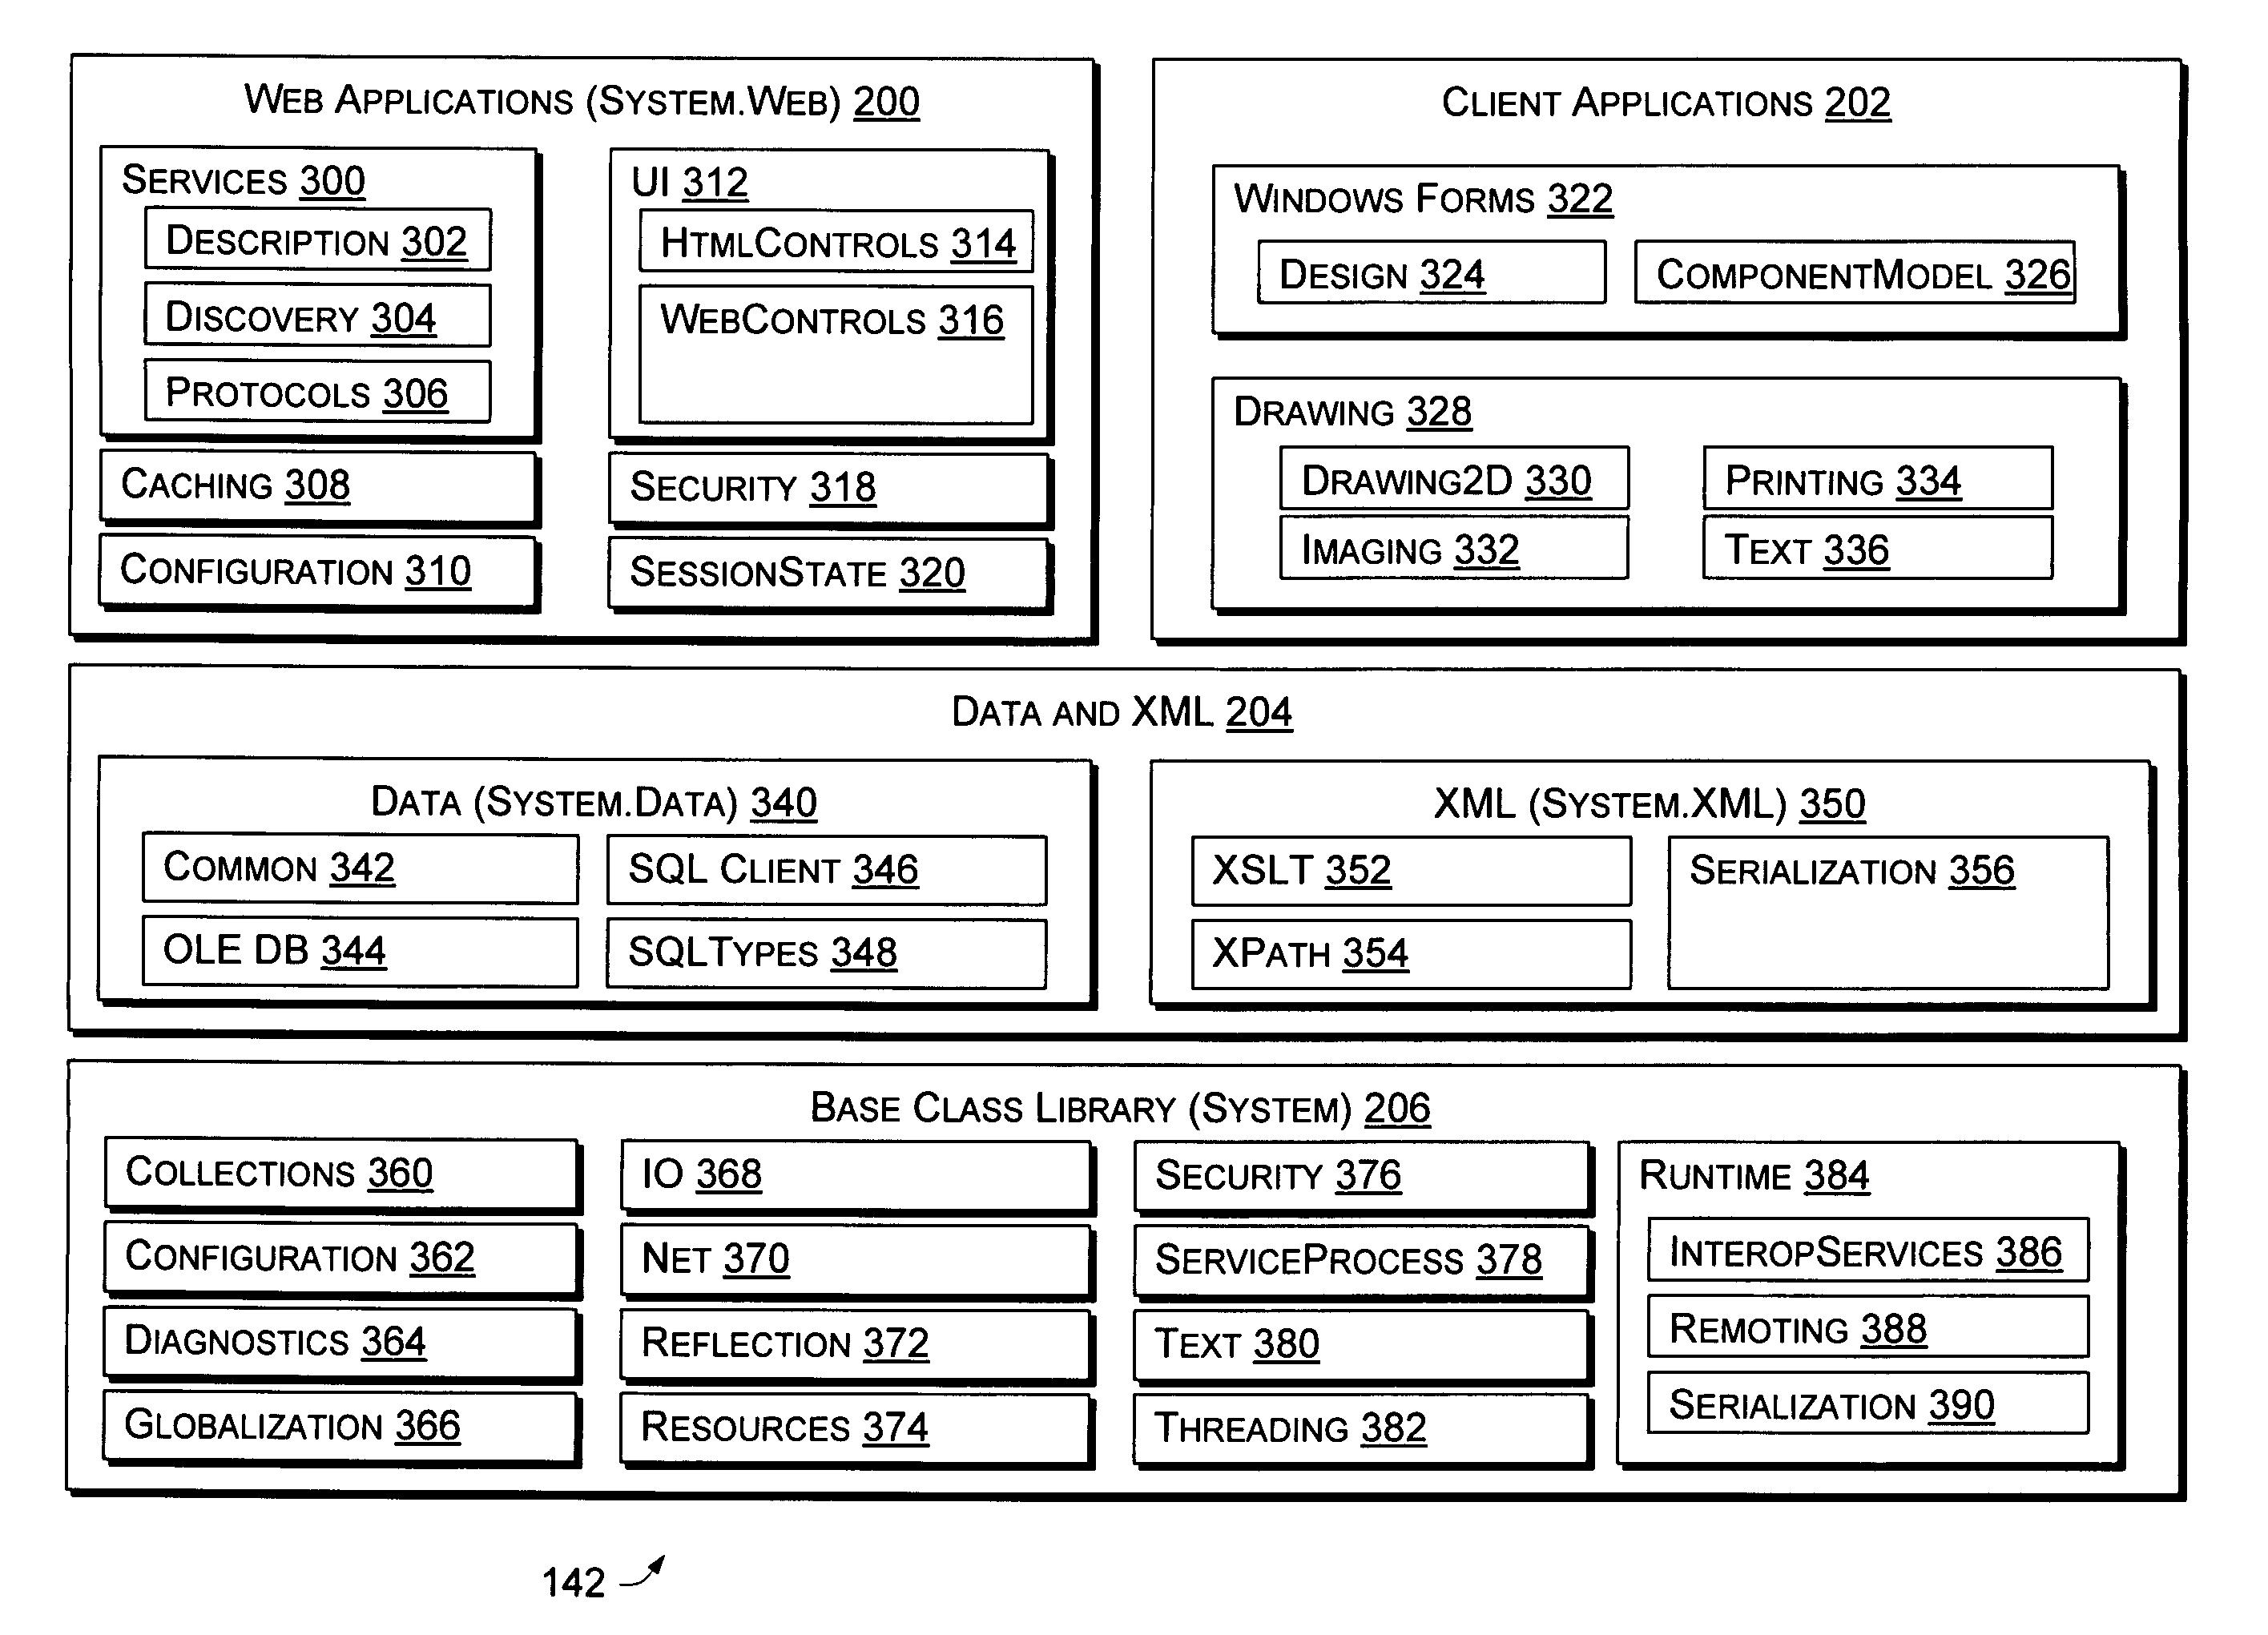 US7013469B2 - Application program interface for network